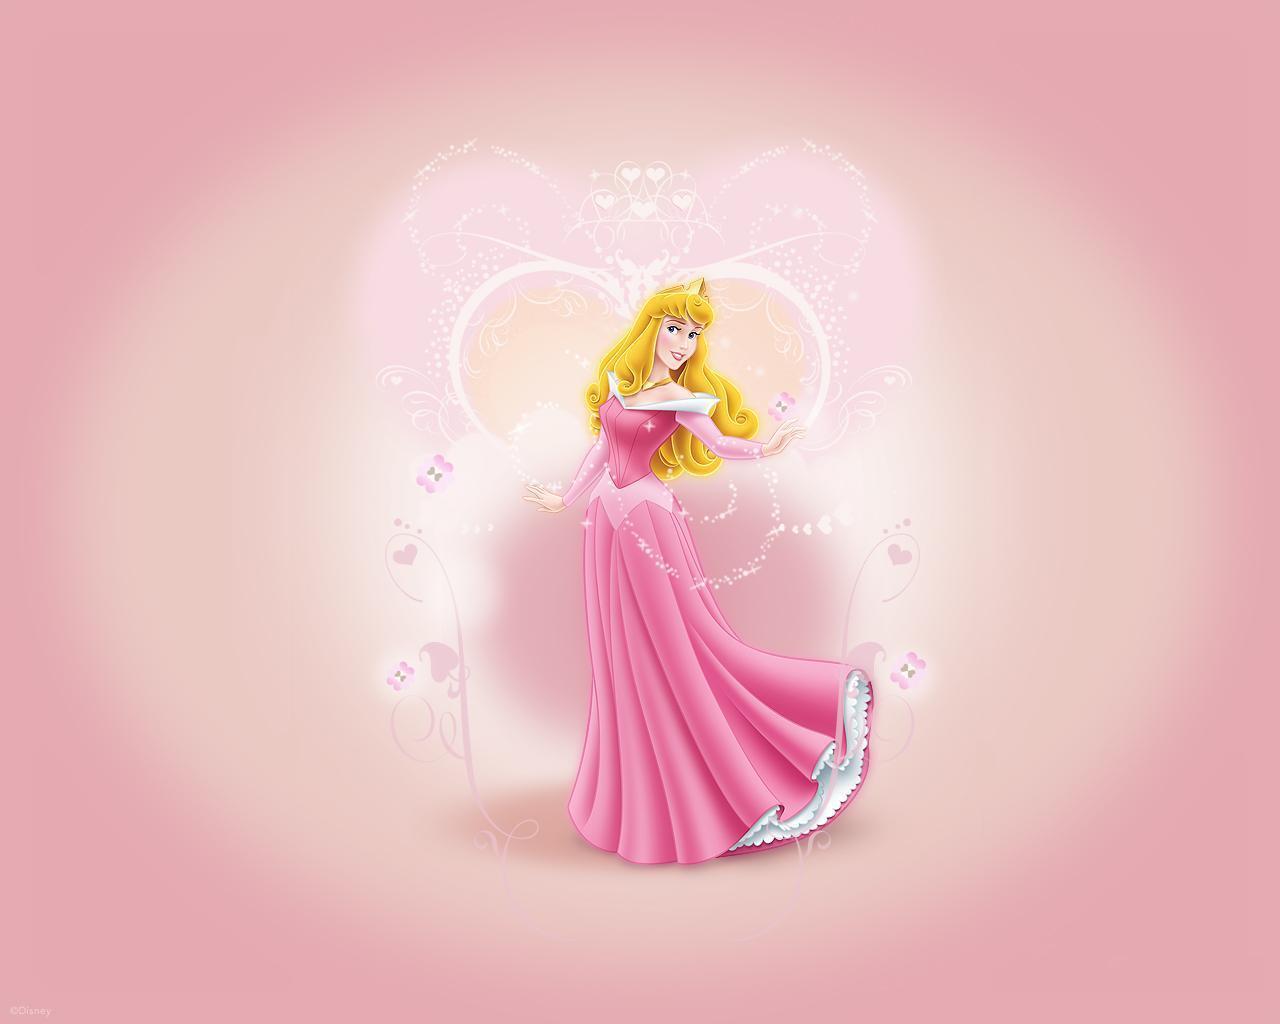 Princess Aurora   Disney Princess Wallpaper 7737345 1280x1024